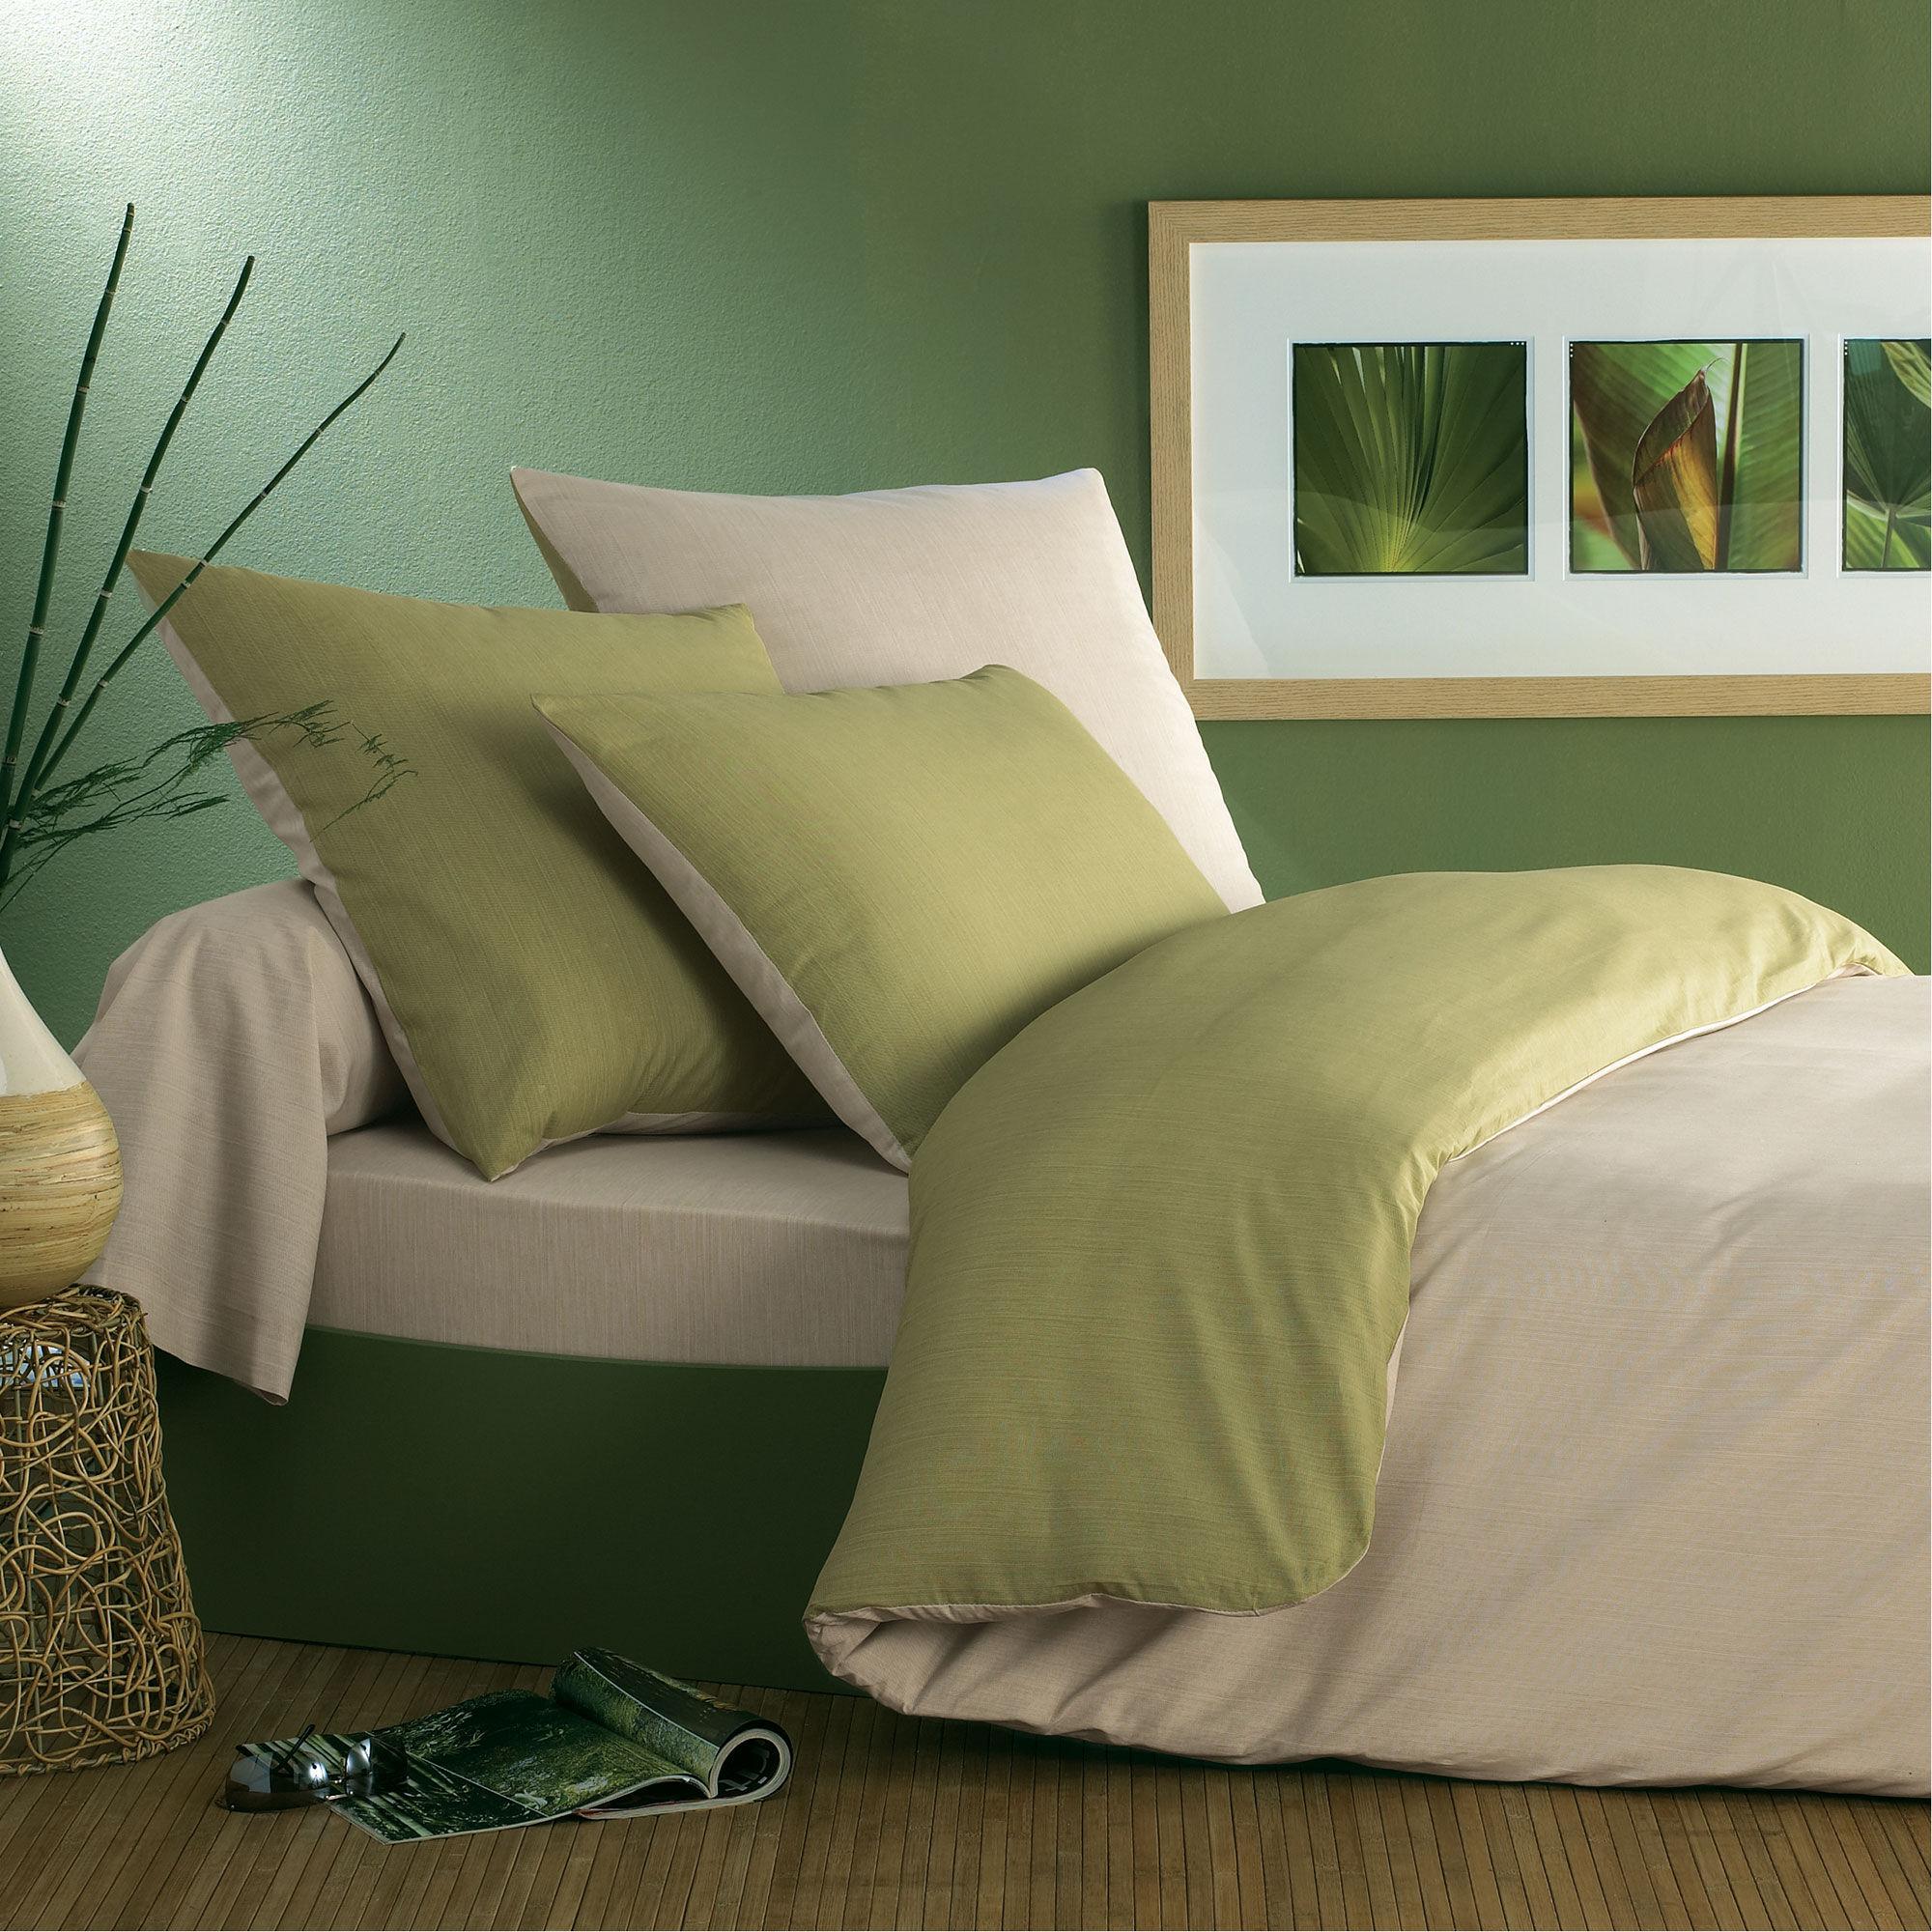 Origin Housse de couette bicolore en bambou  bicolore 140 x 200